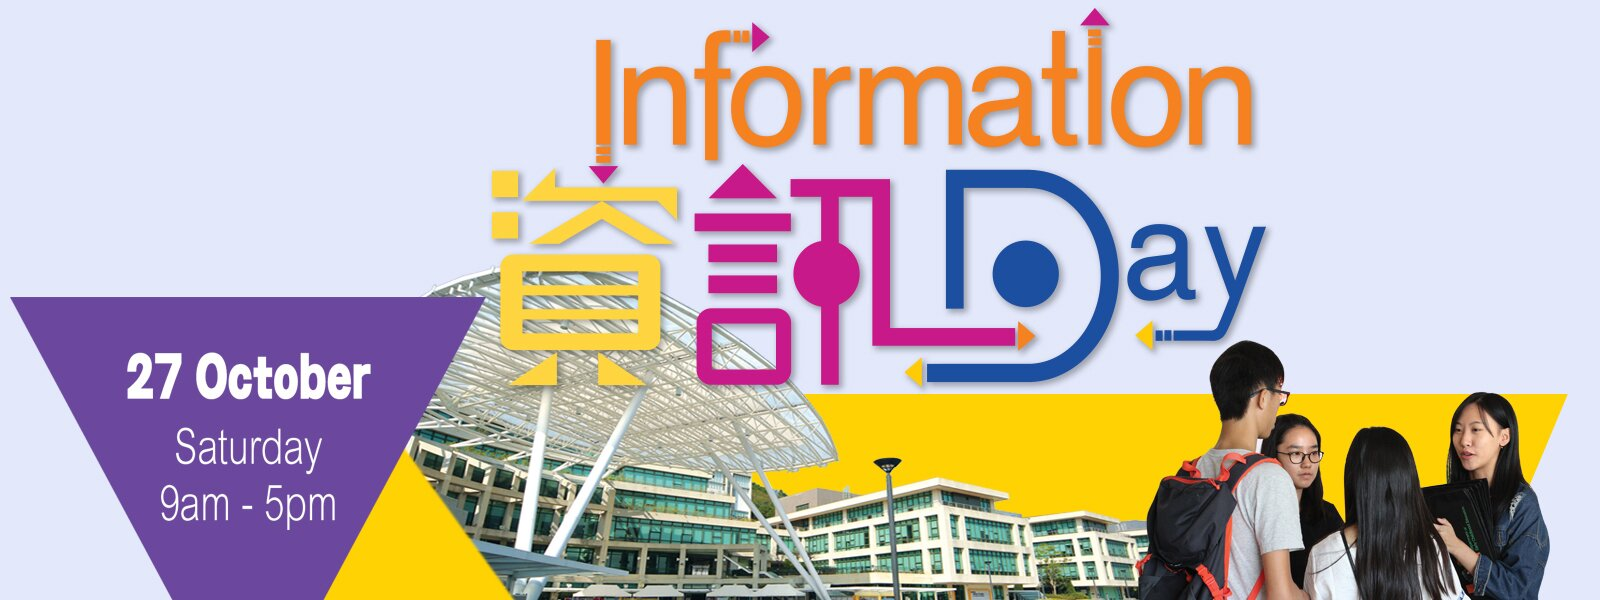 EdUHK Information Day